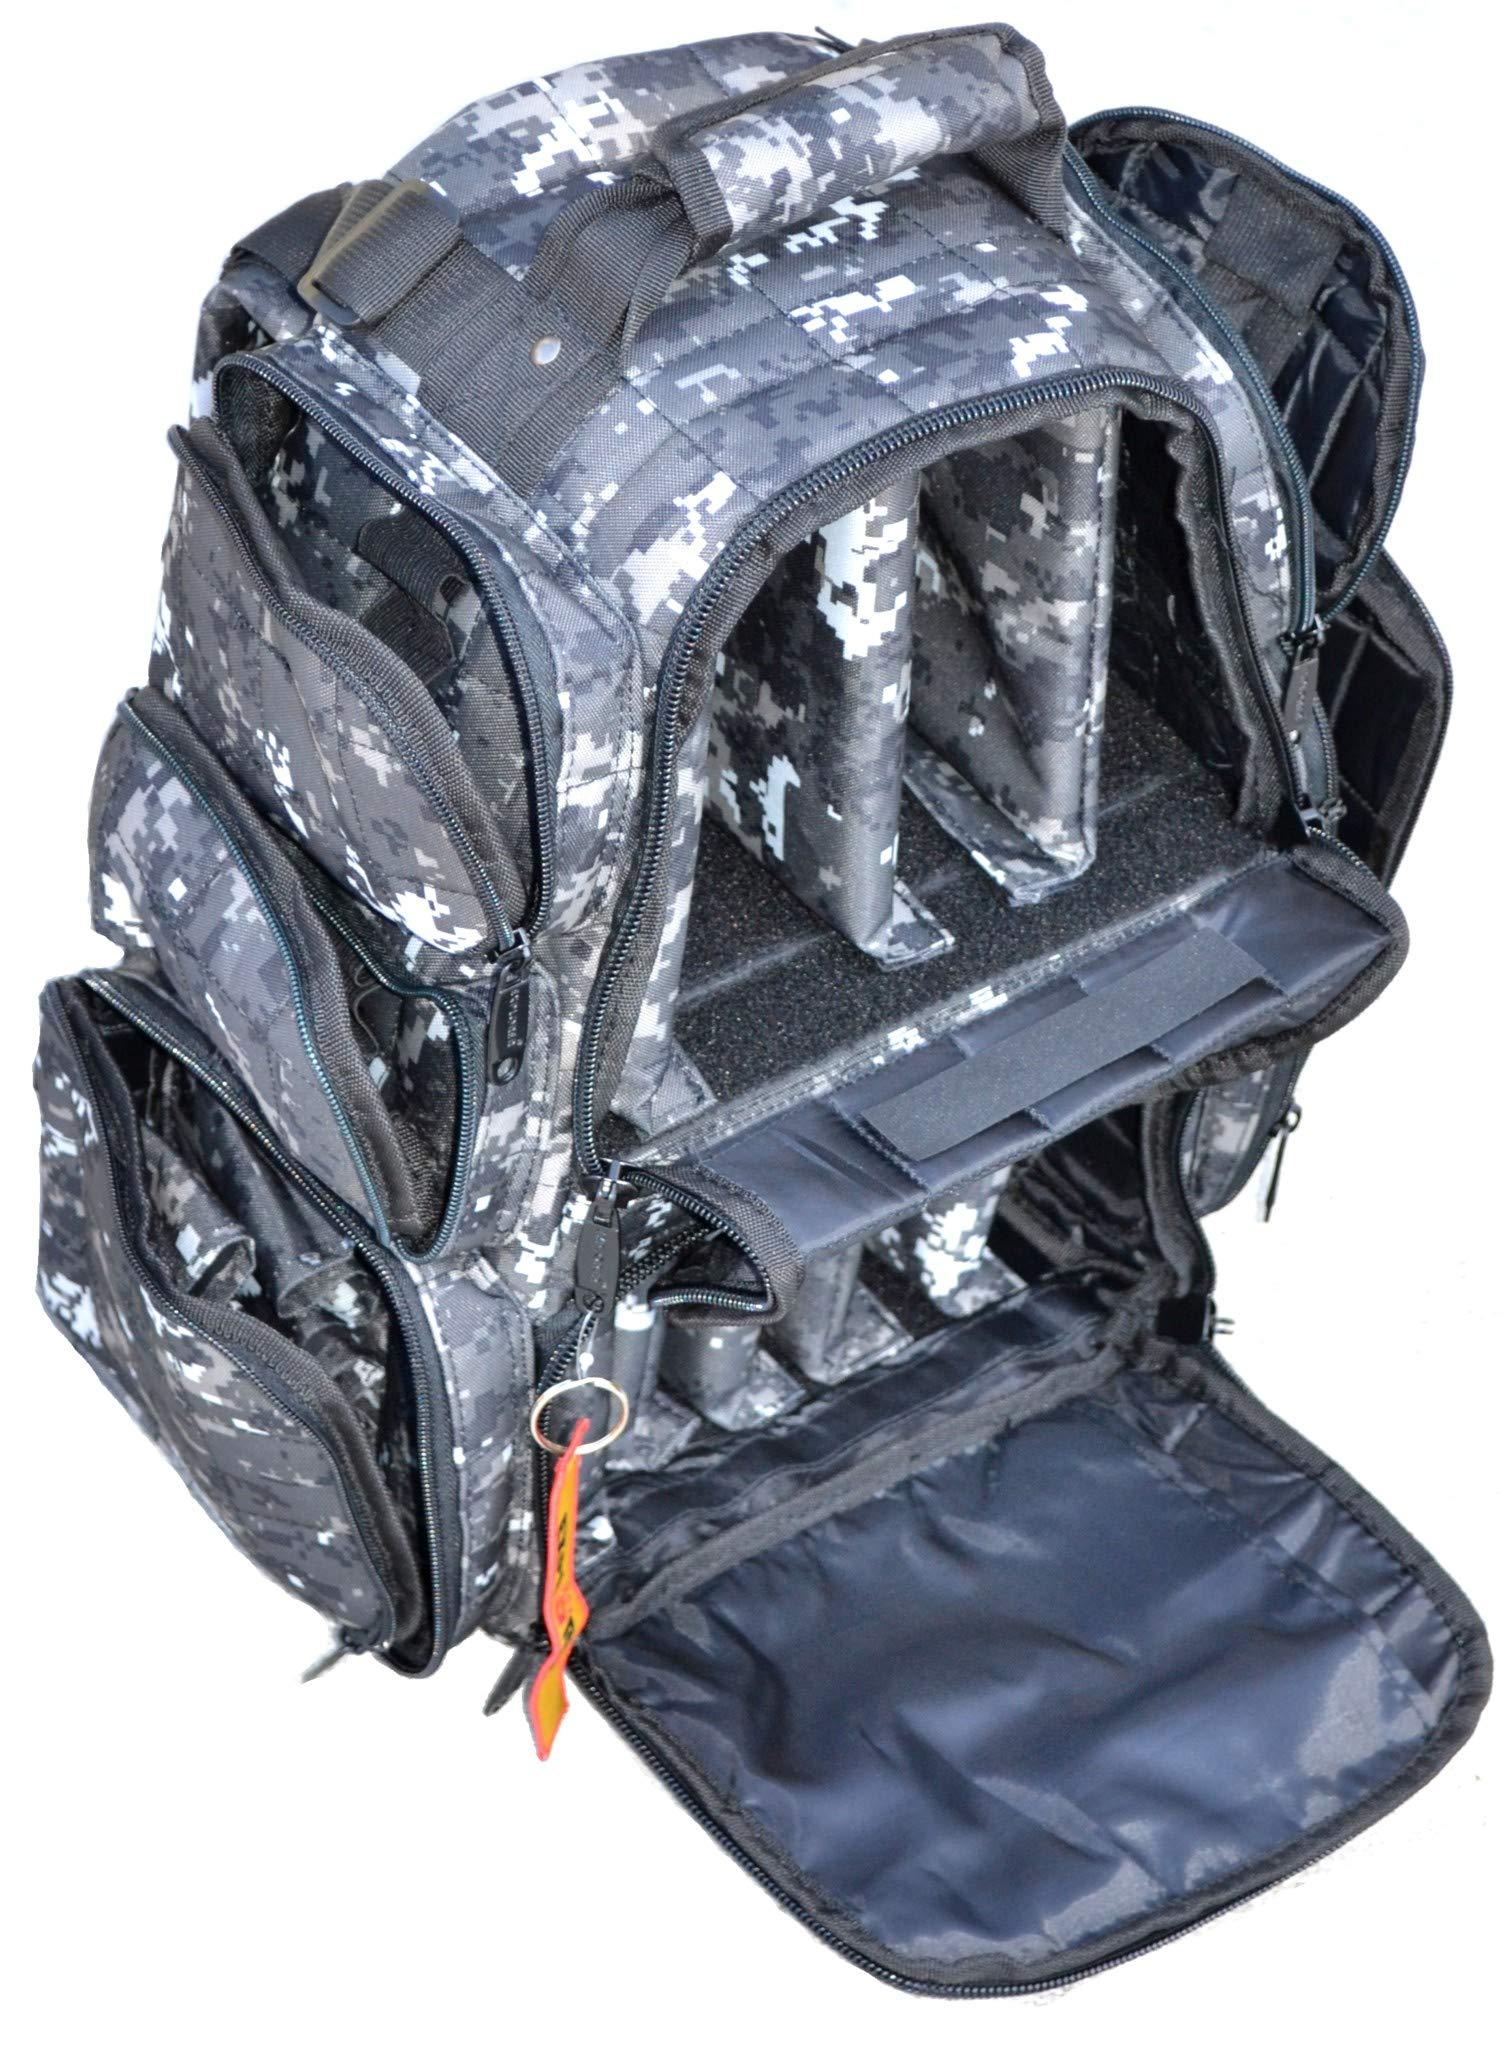 Backpack + Range Bag with Large Padded Deluxe Tactical Divider and 9 Clip Mag Holder - Rangemaster Gear Bag Explorer (Black Camo) by EXPLORER